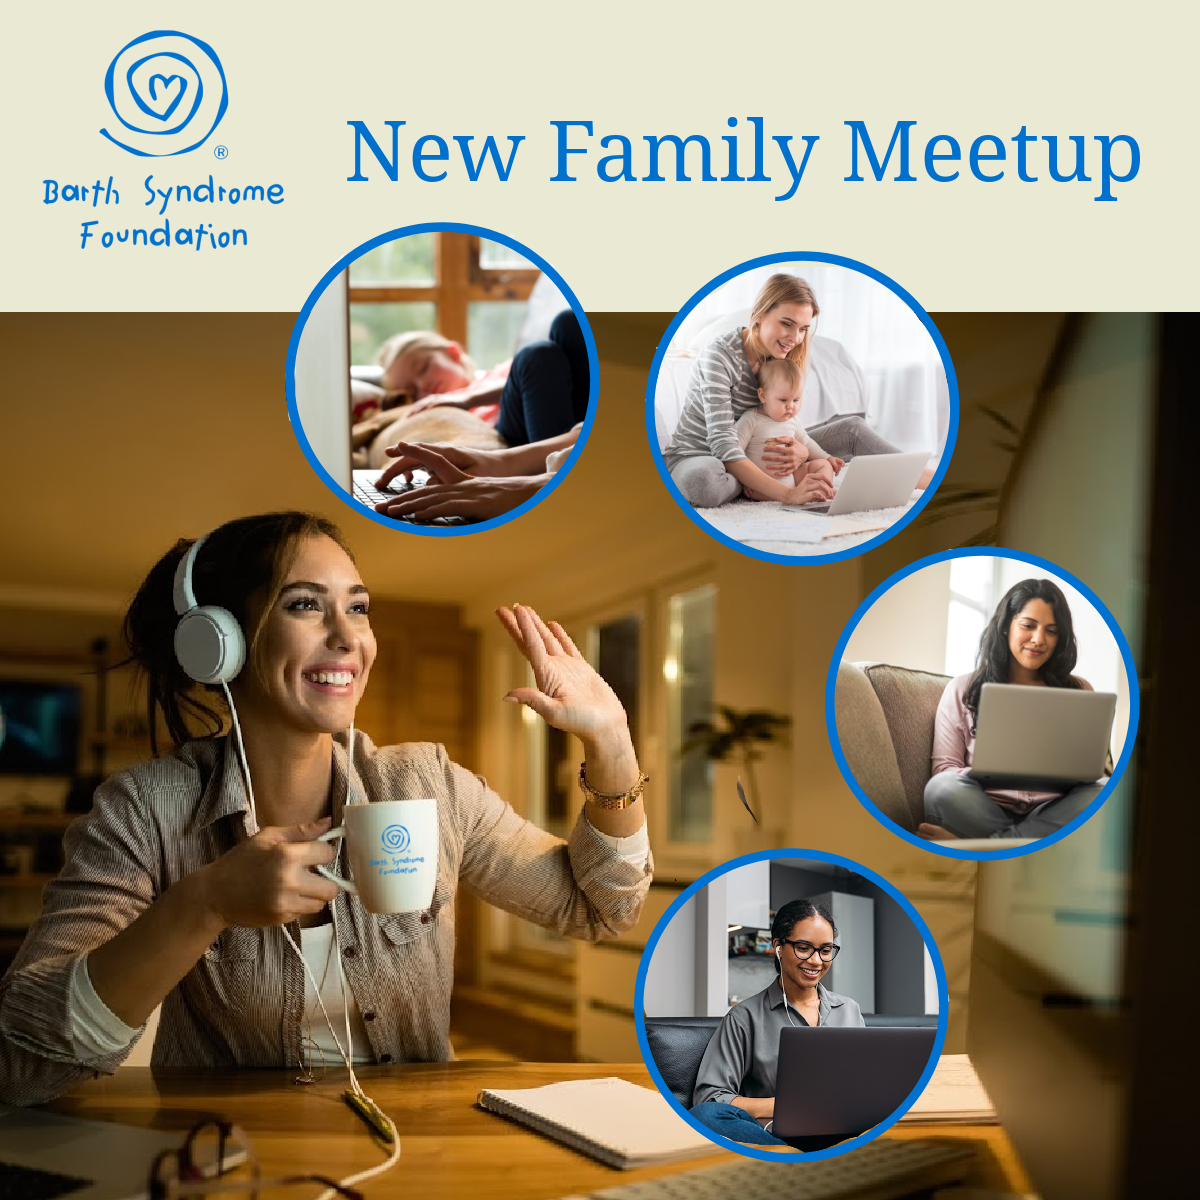 New Family Meetup